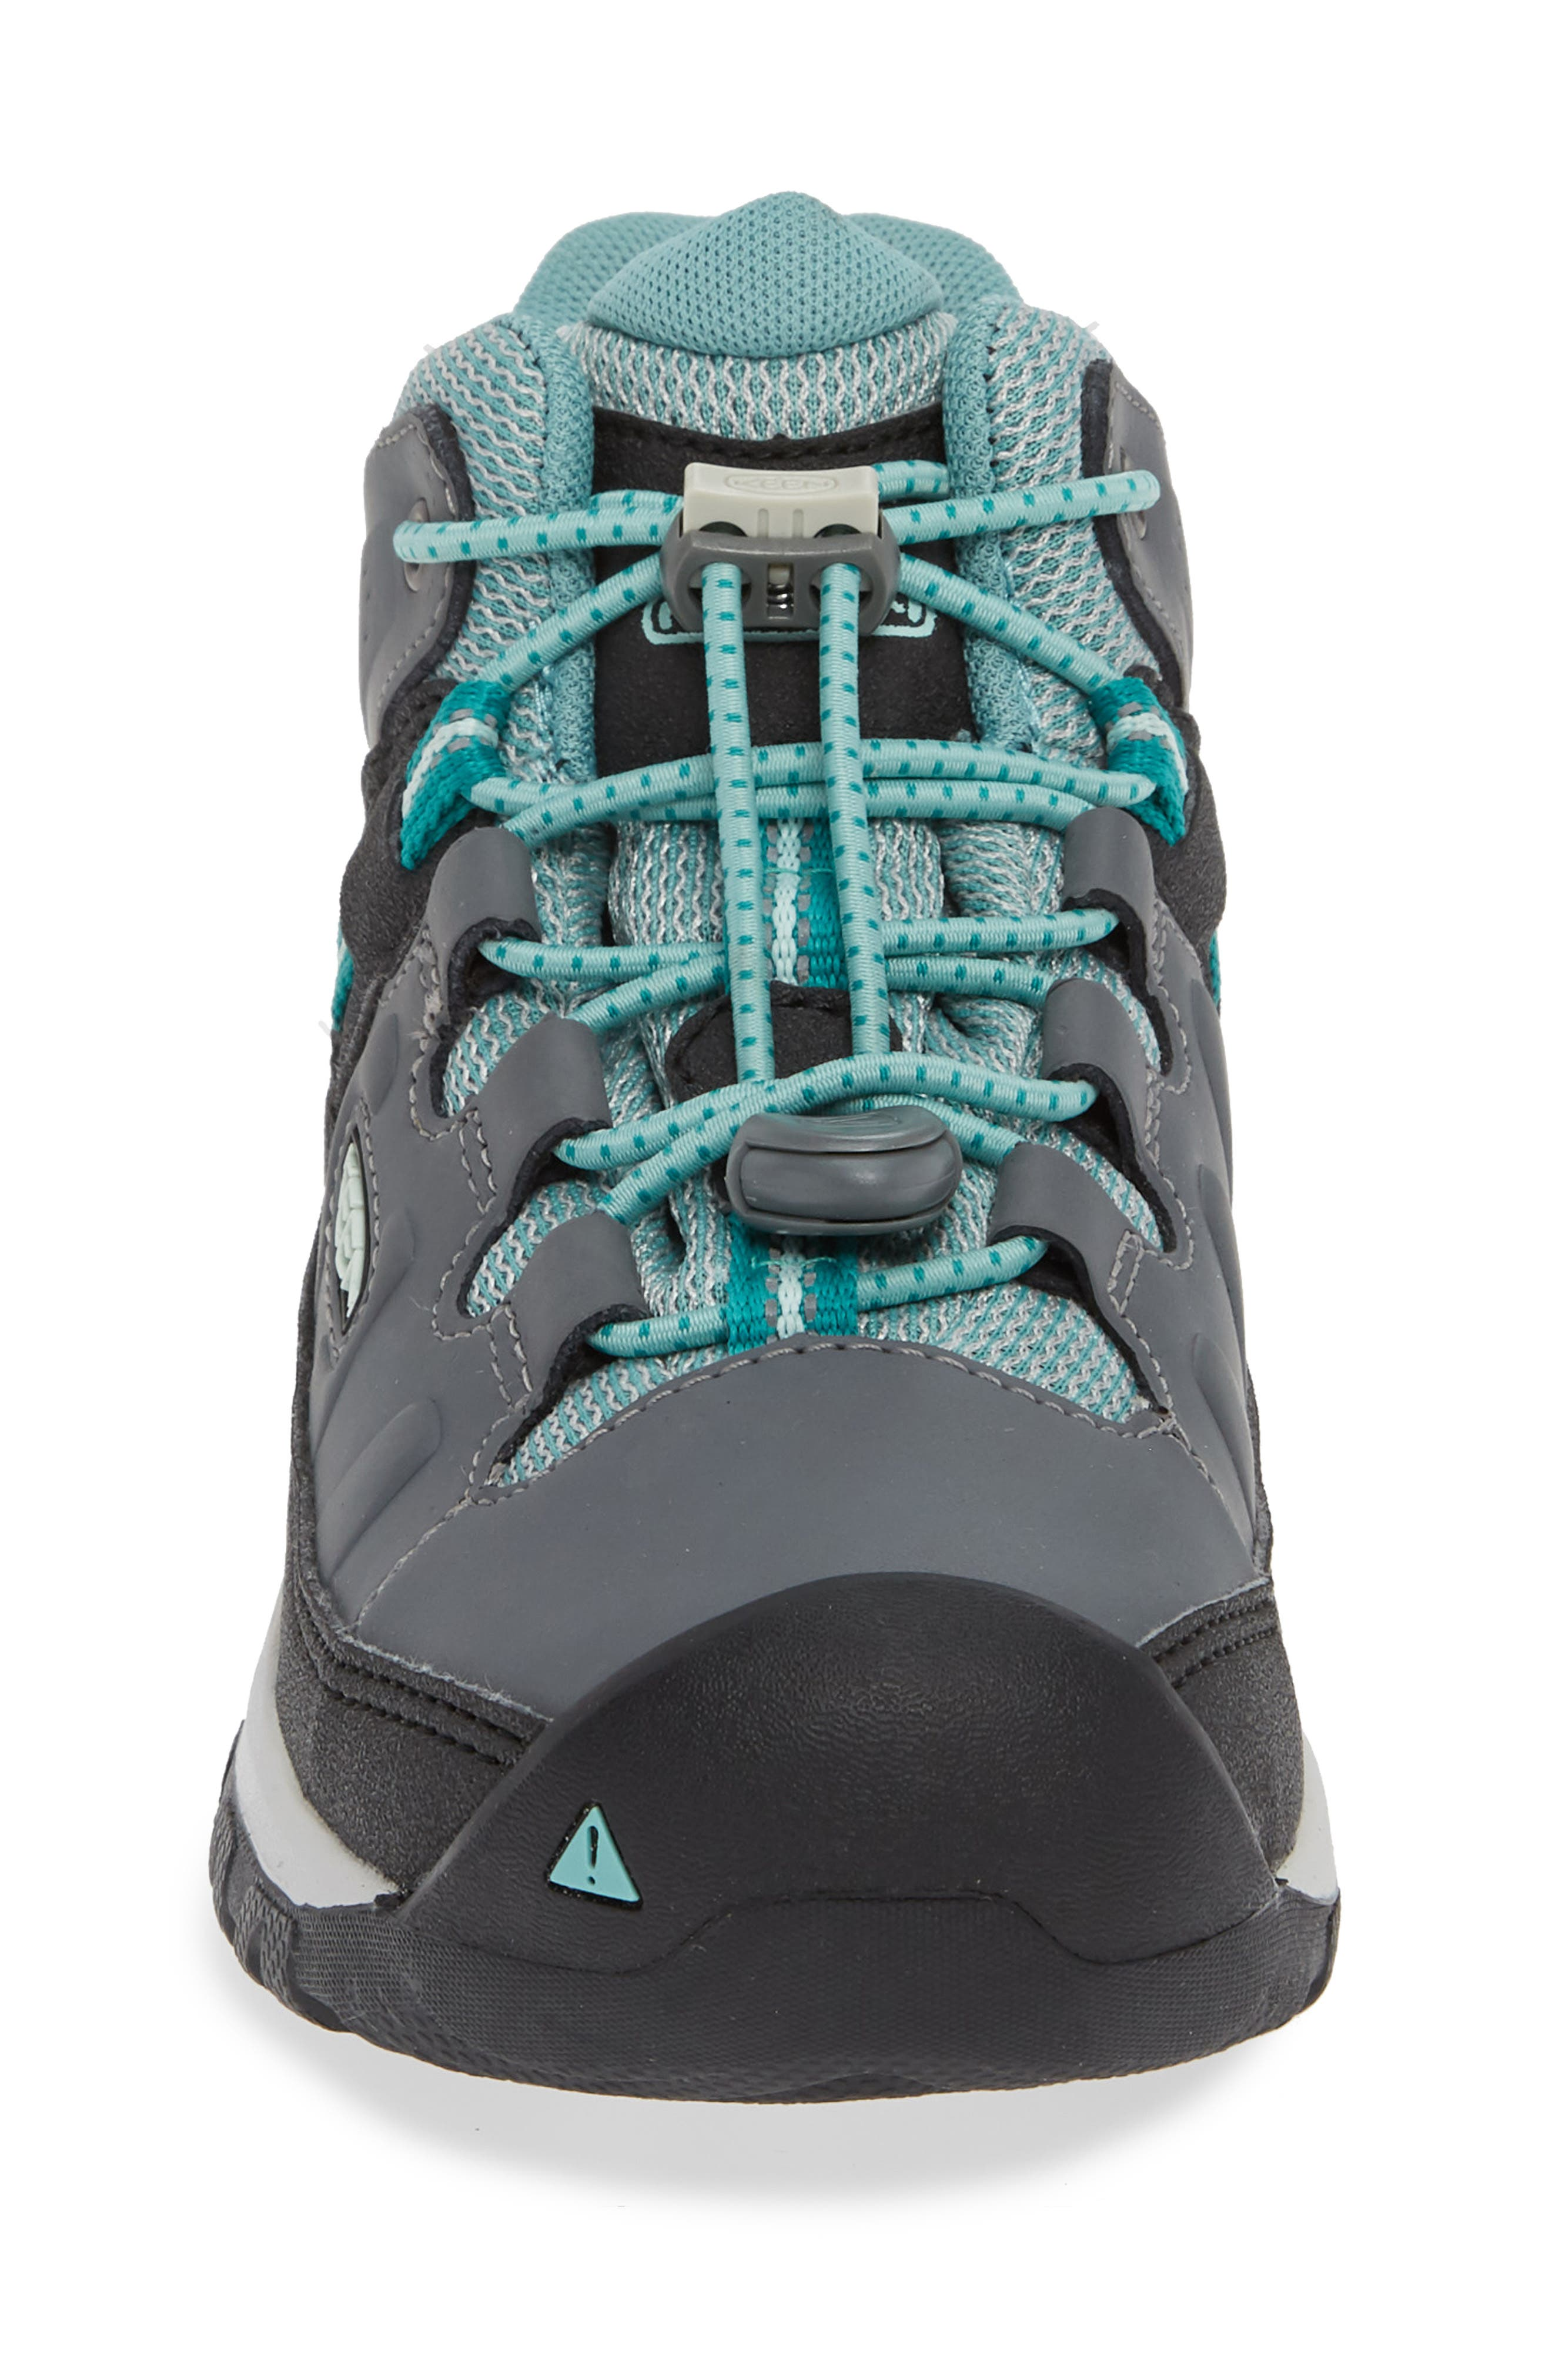 Targhee Mid Waterproof Hiking Boot,                             Alternate thumbnail 4, color,                             GREY/ WASABI